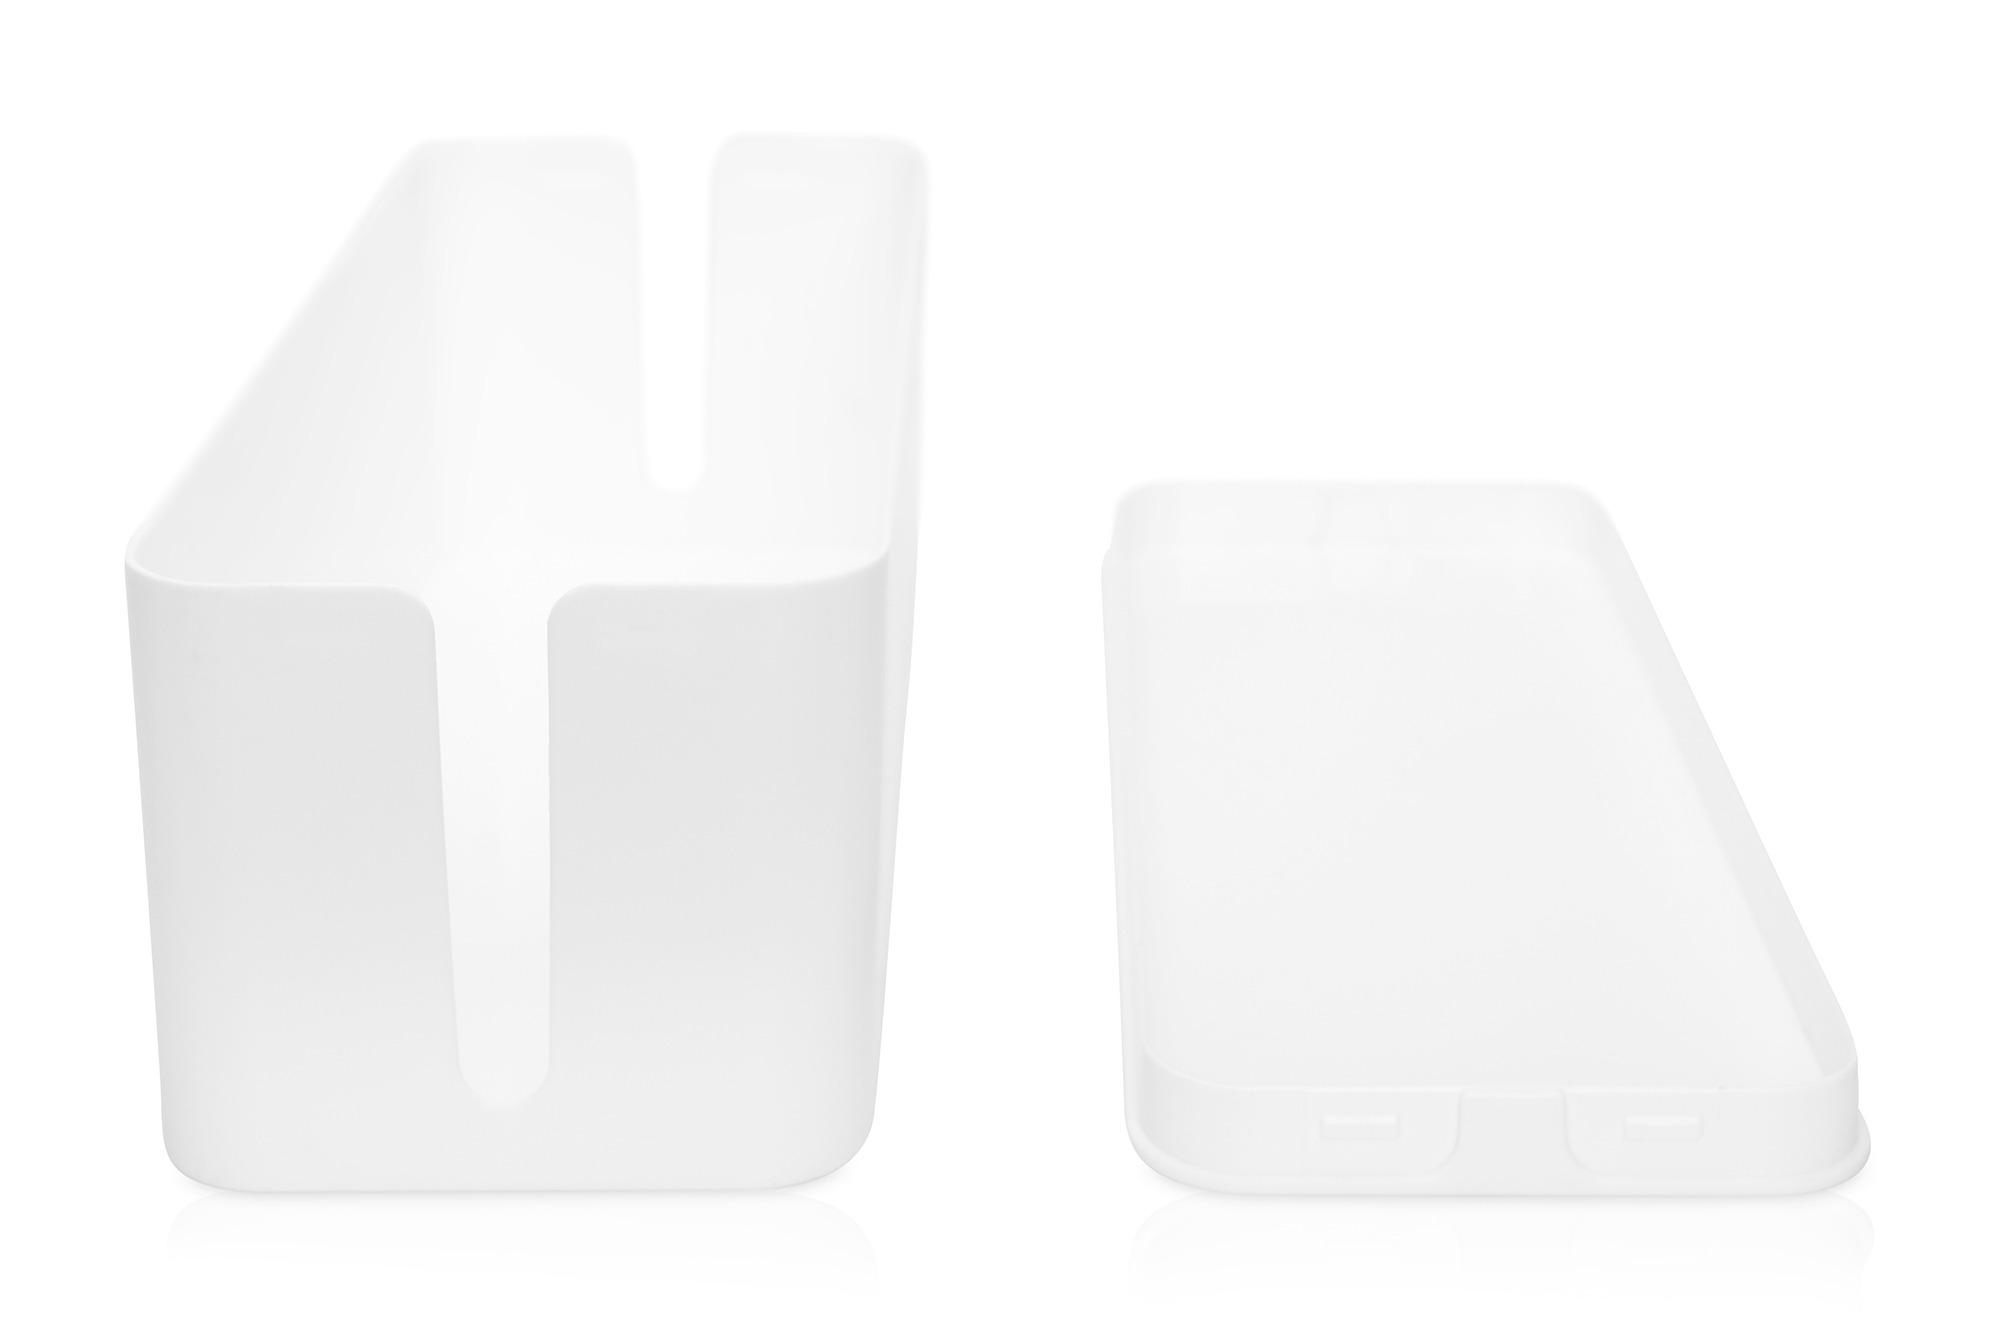 Scatola gestione cavi colore bianco dimensioni 40,6 x prof. 15,6 x alt. 13,4 cm